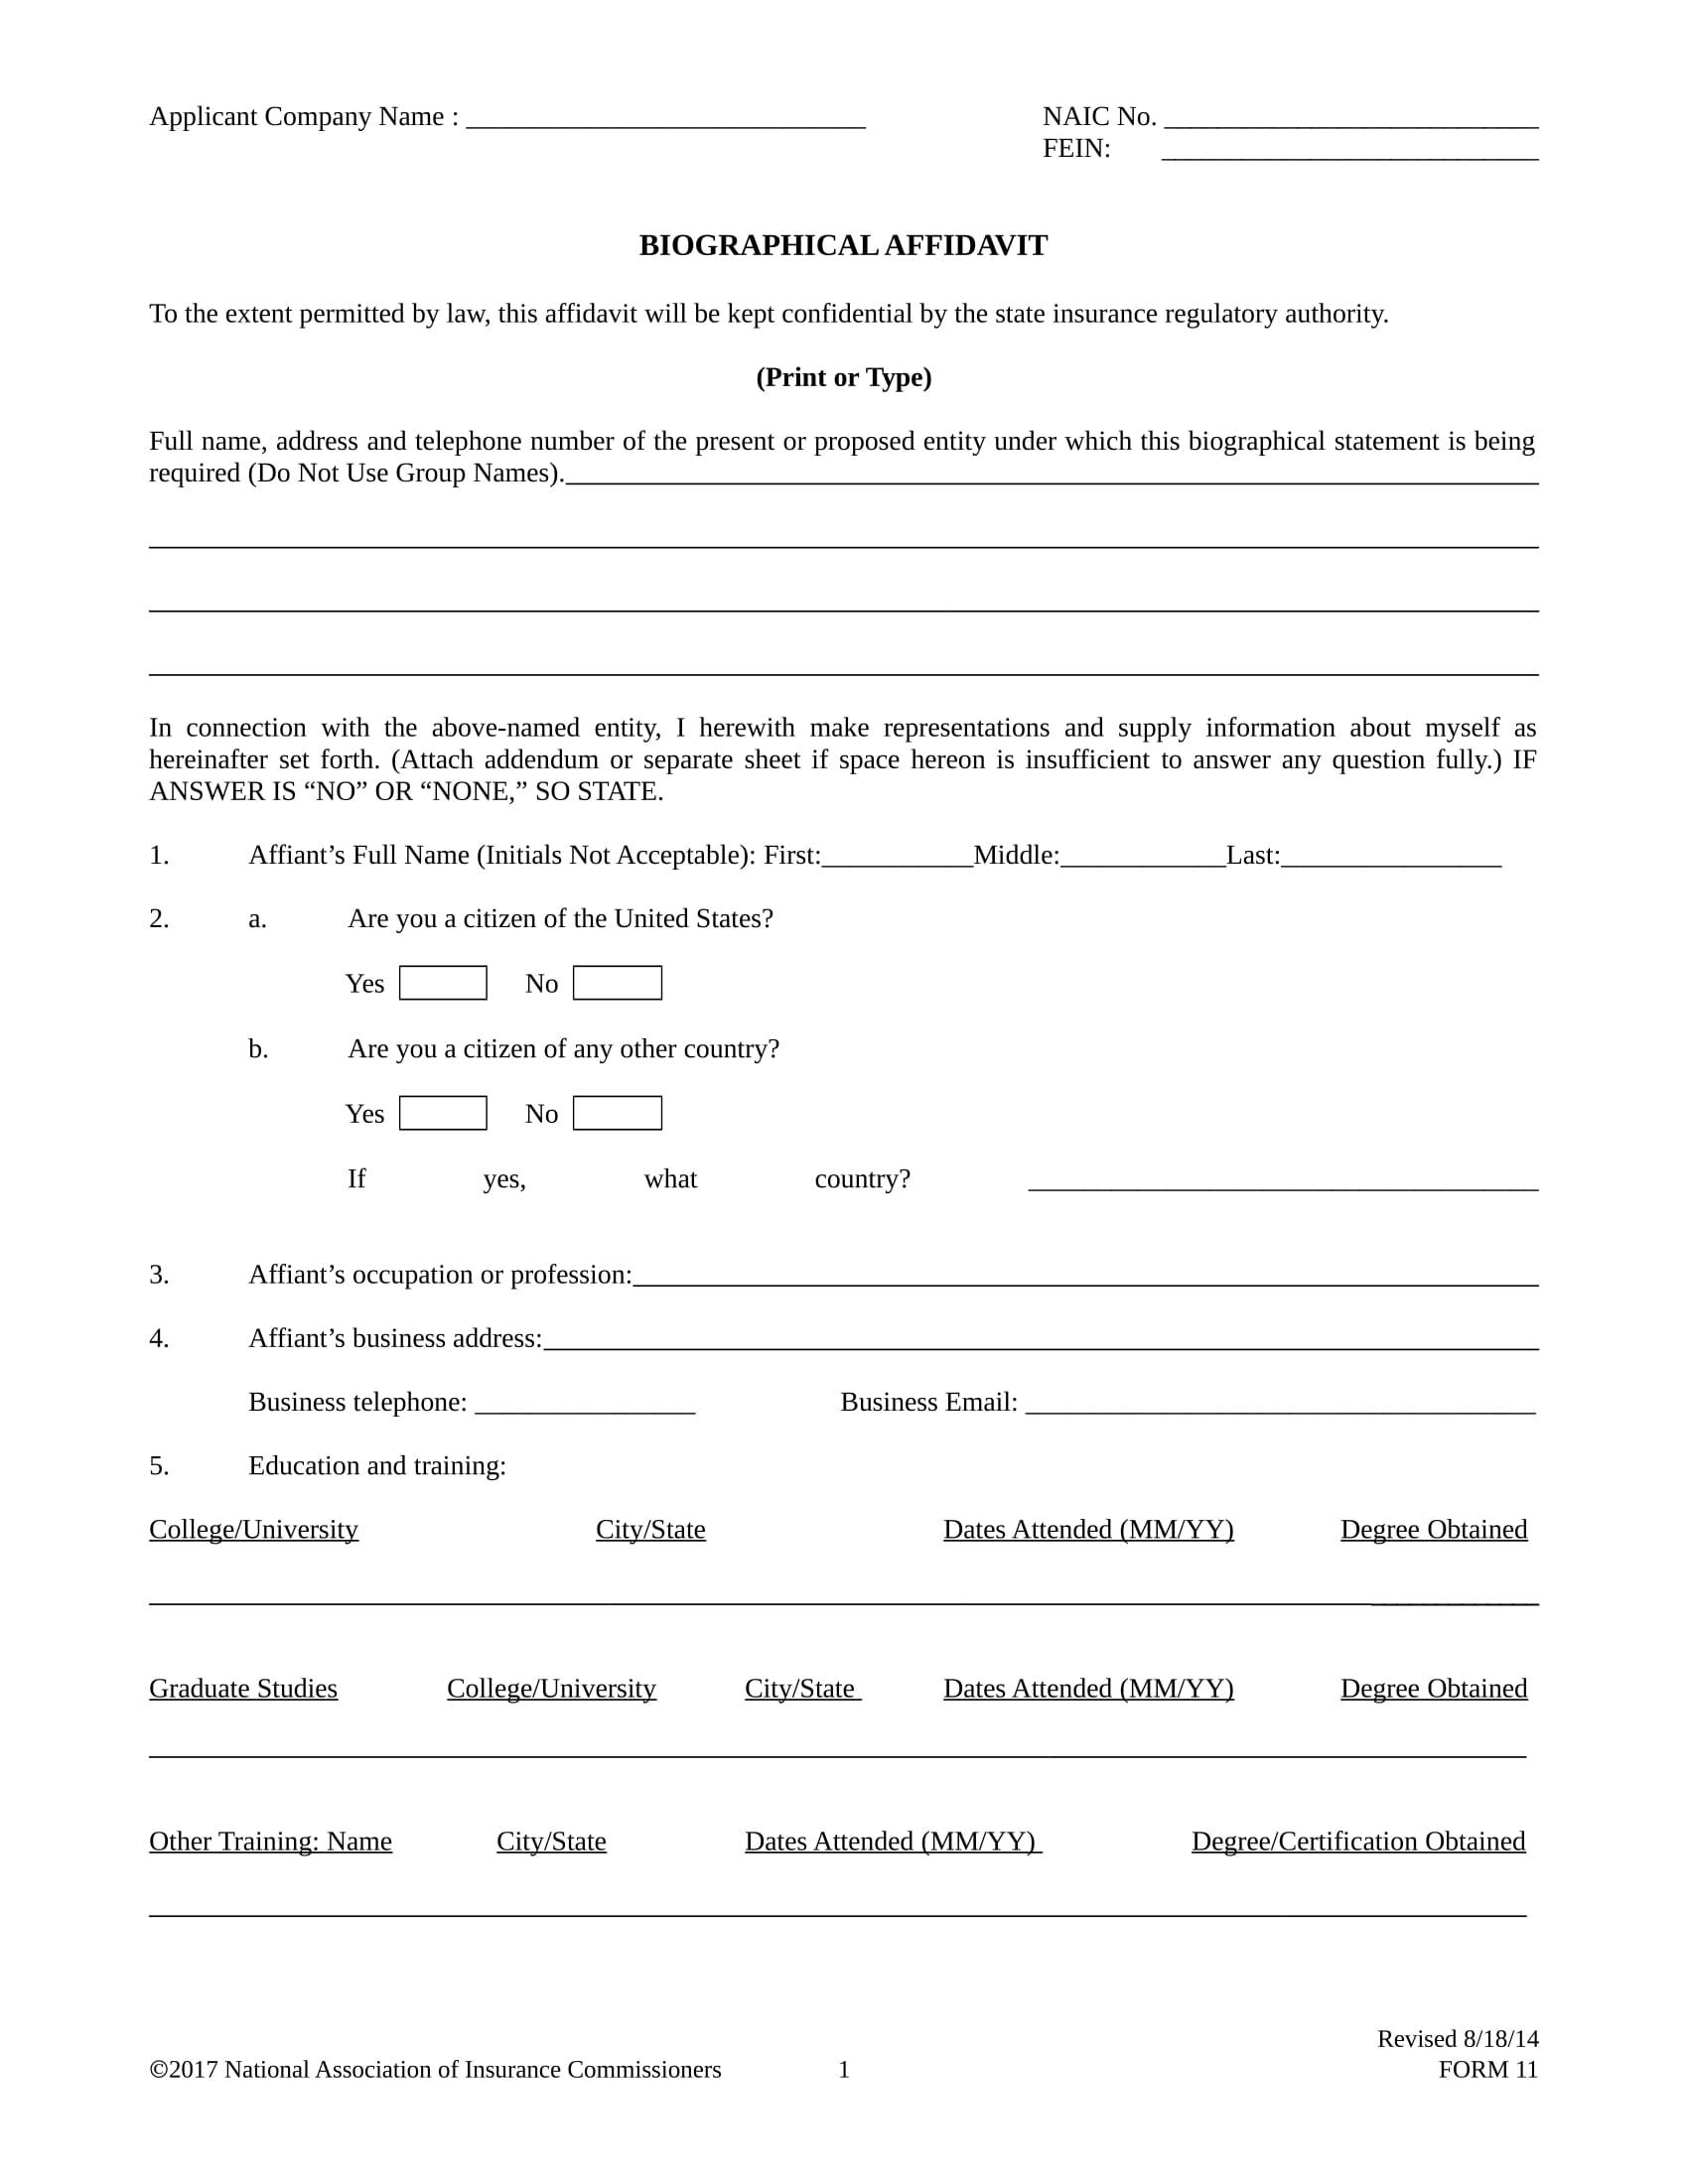 biographical affidavit sample format 01